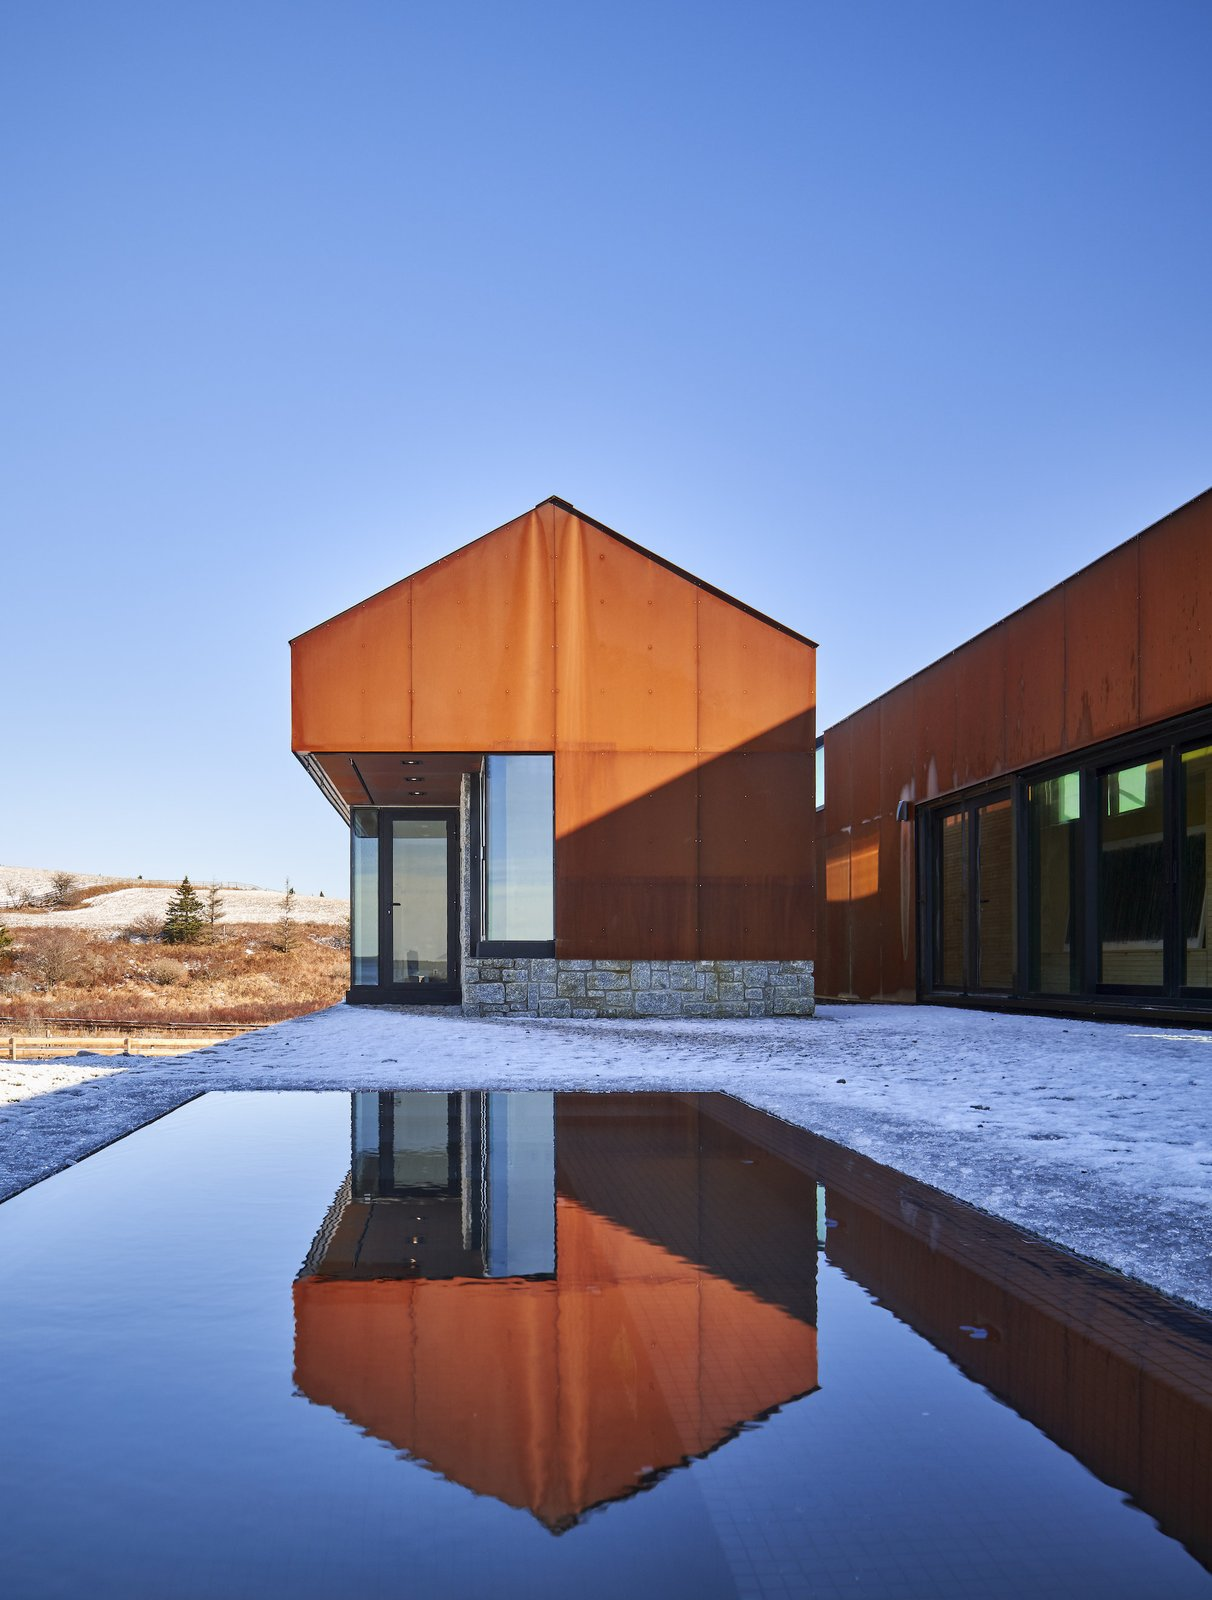 The night pavilion of Smith House by MacKay-Lyons Sweetapple Architects.